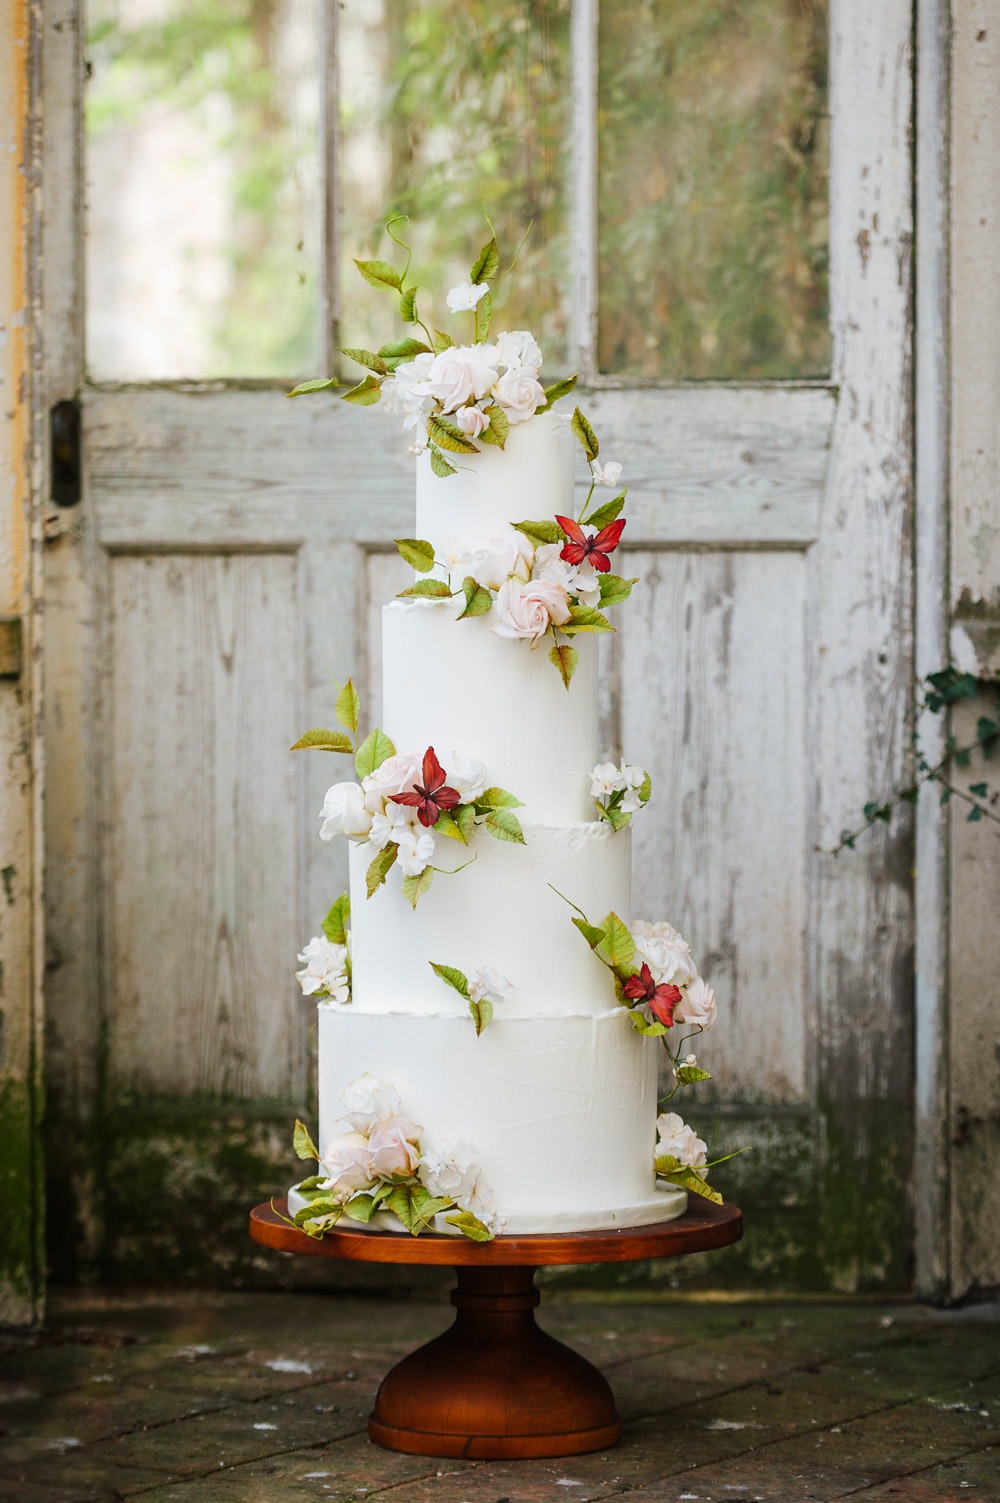 Iced Cake Floral Flowers Cherry Blossom Wedding Ideas Sugarbird Photography